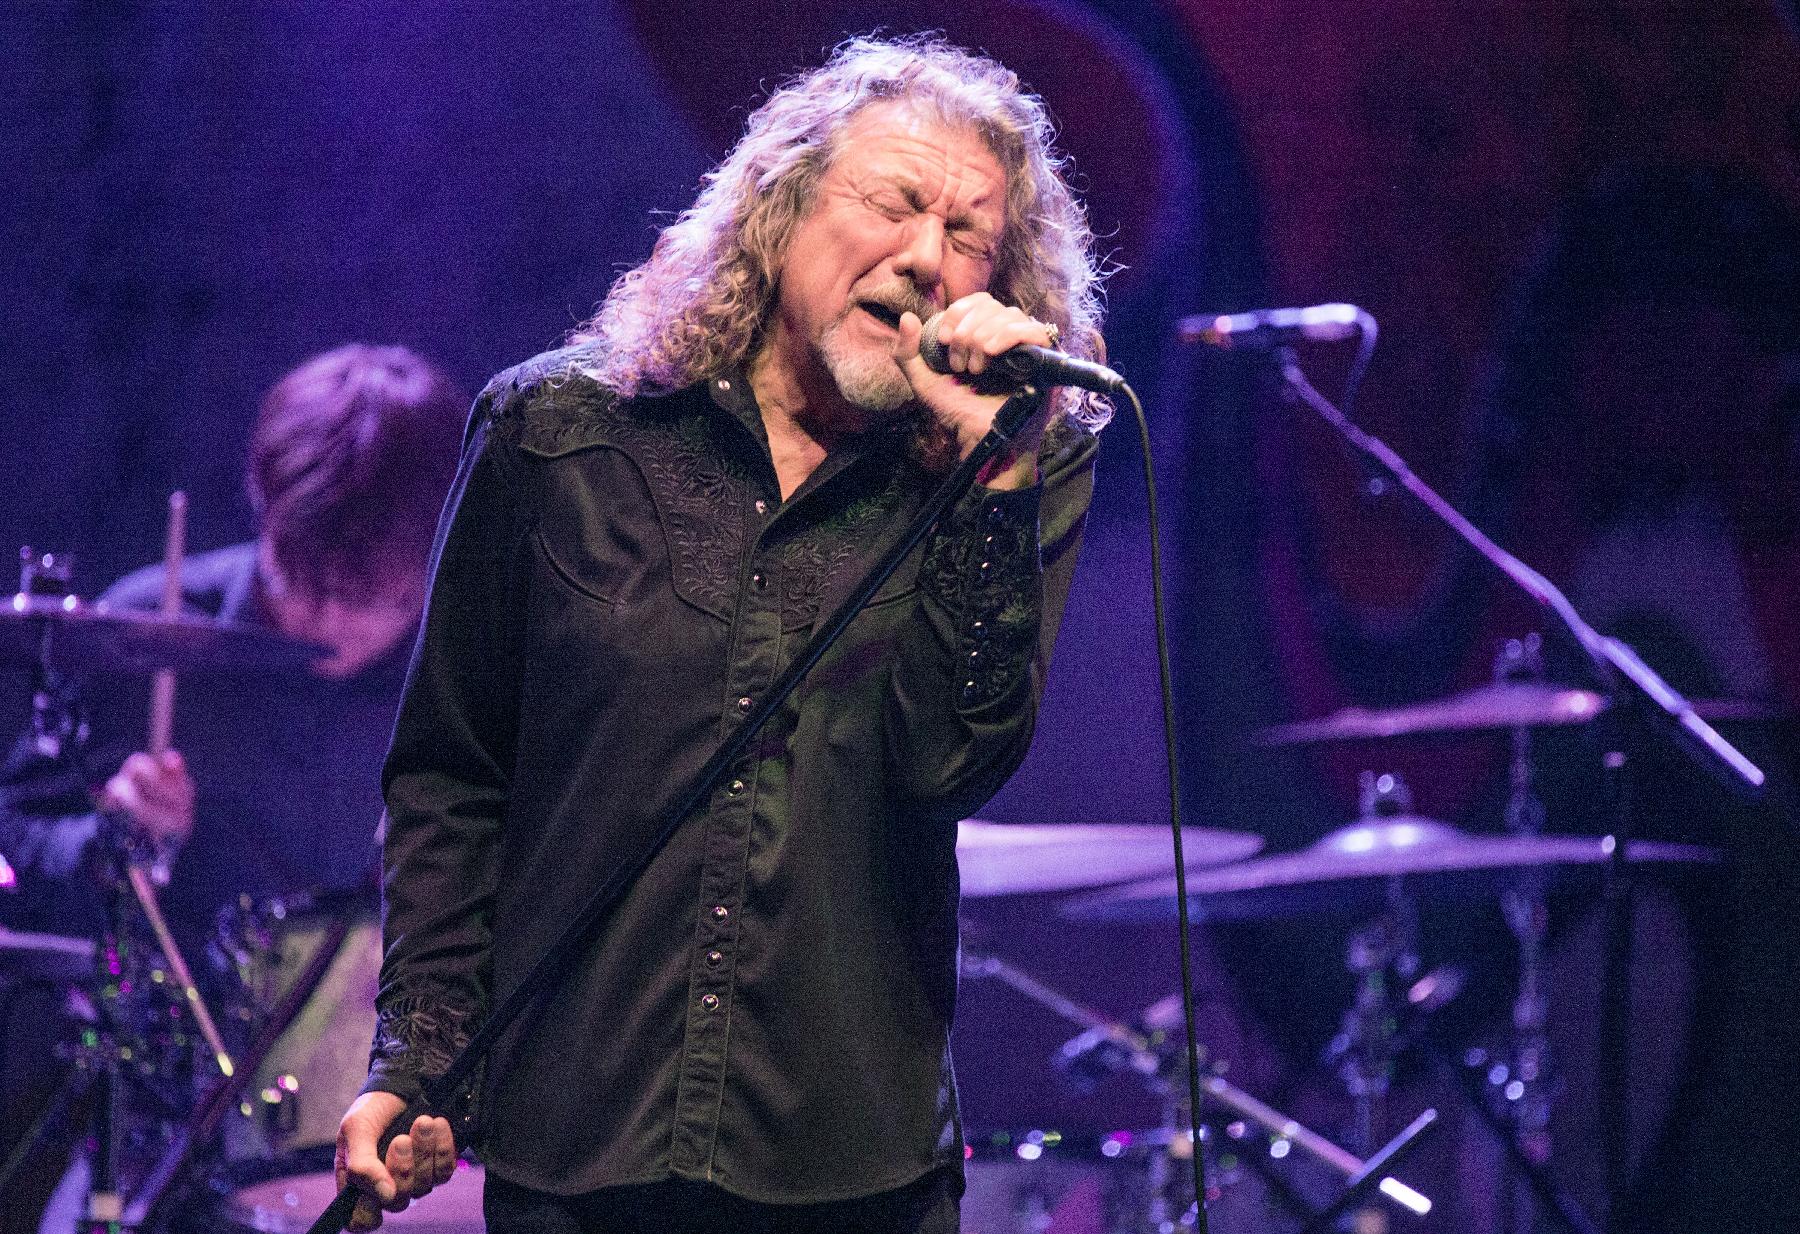 Robert Plant Slams Idea of Zeppelin Tour: 'I'm Not Part of a Jukebox'